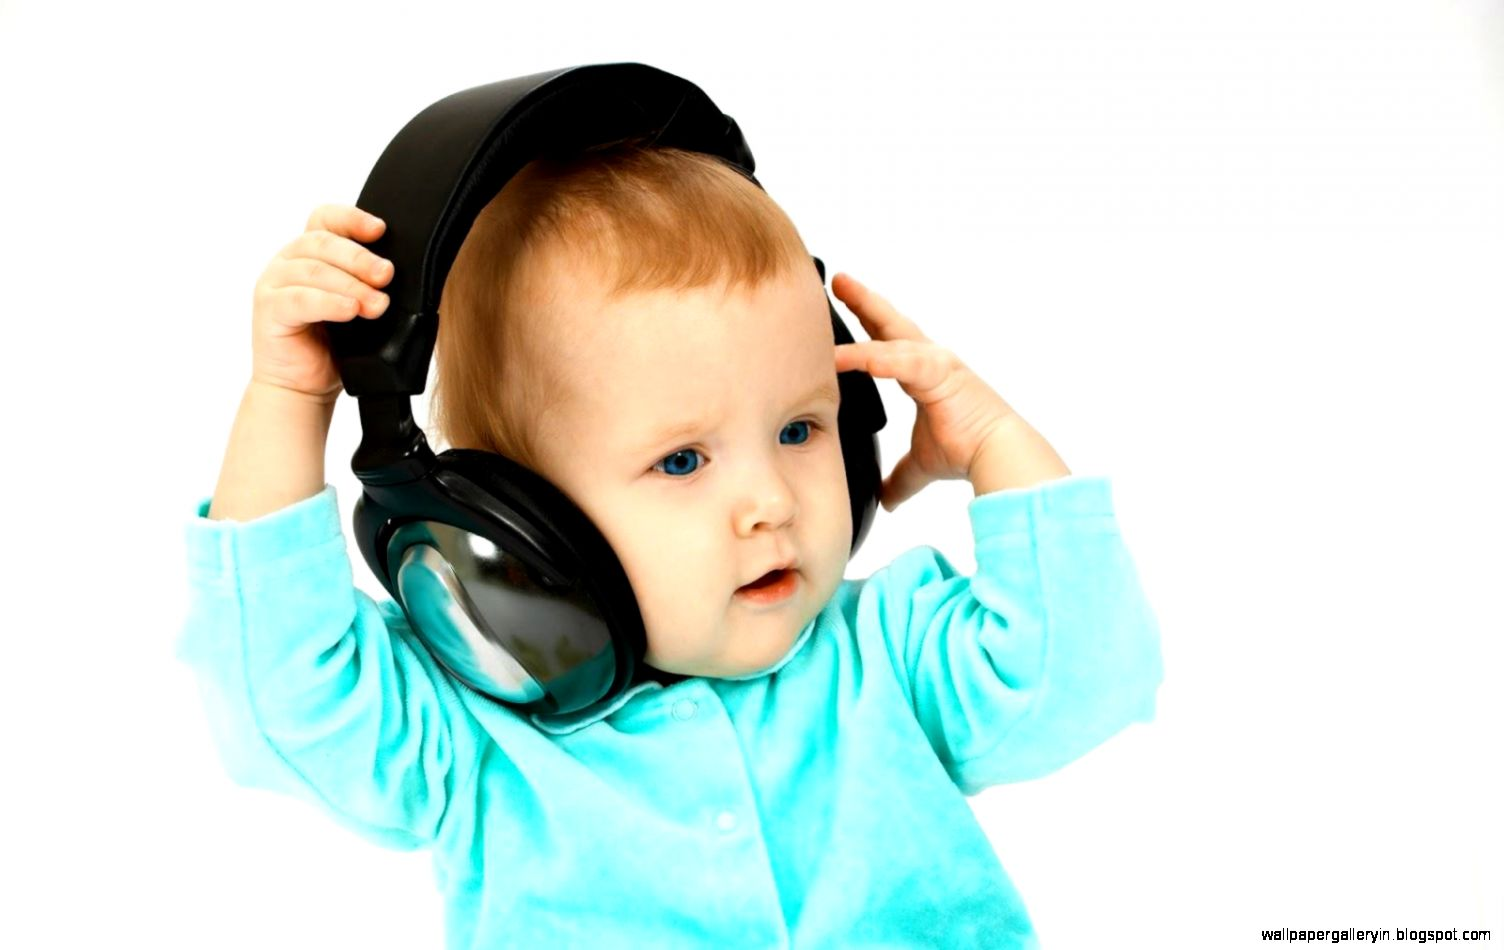 cute kid backgrounds - hola.klonec.co